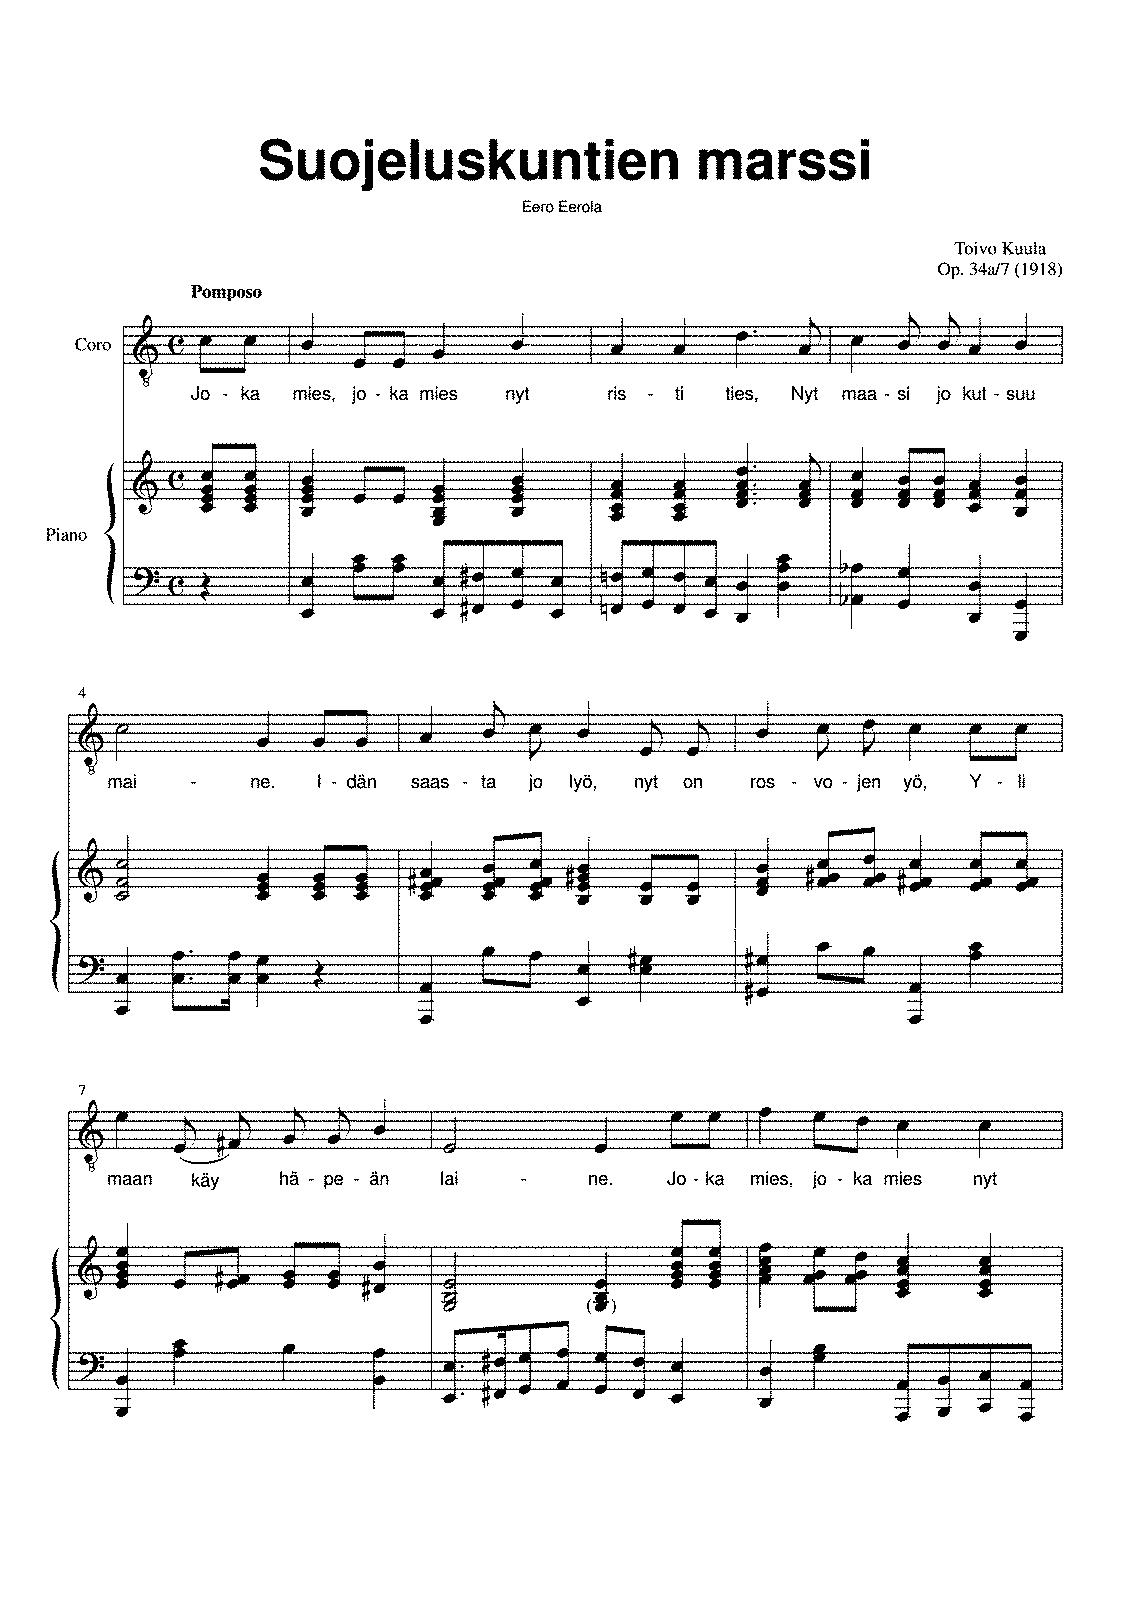 Suojeluskuntien marssi op34a no7b kuula toivo imslp arrangements and transcriptions hexwebz Choice Image